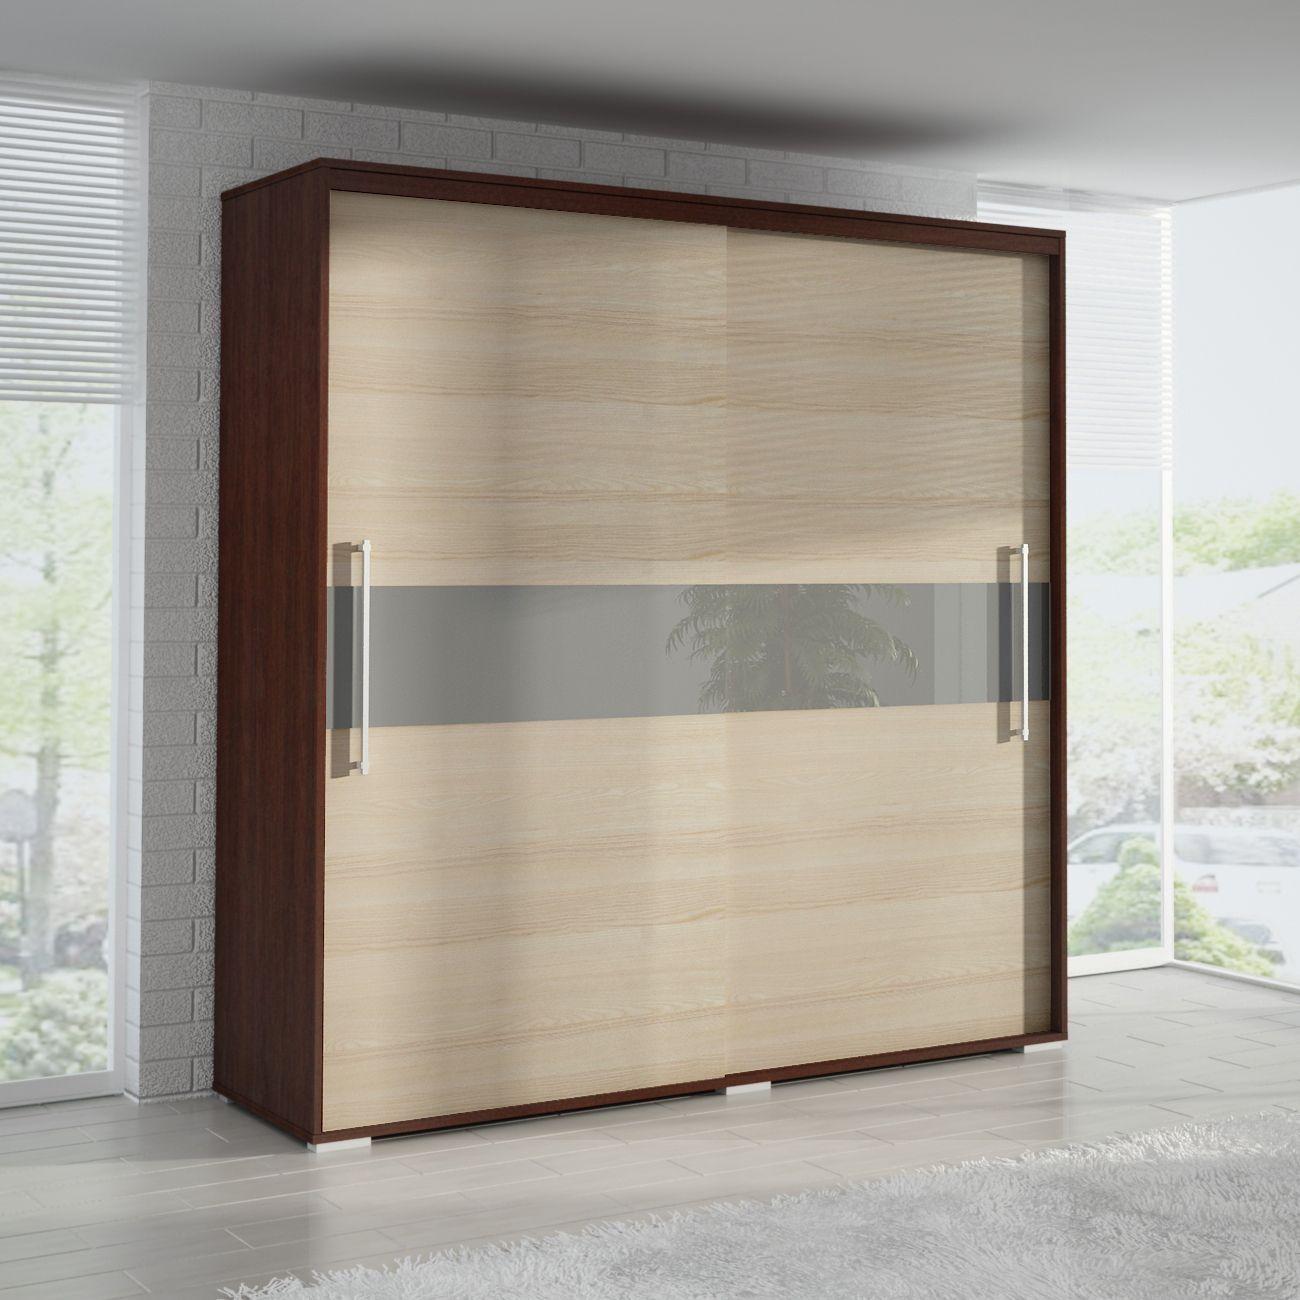 Wardrobe Armoire With Sliding Doors Furniture, Modern